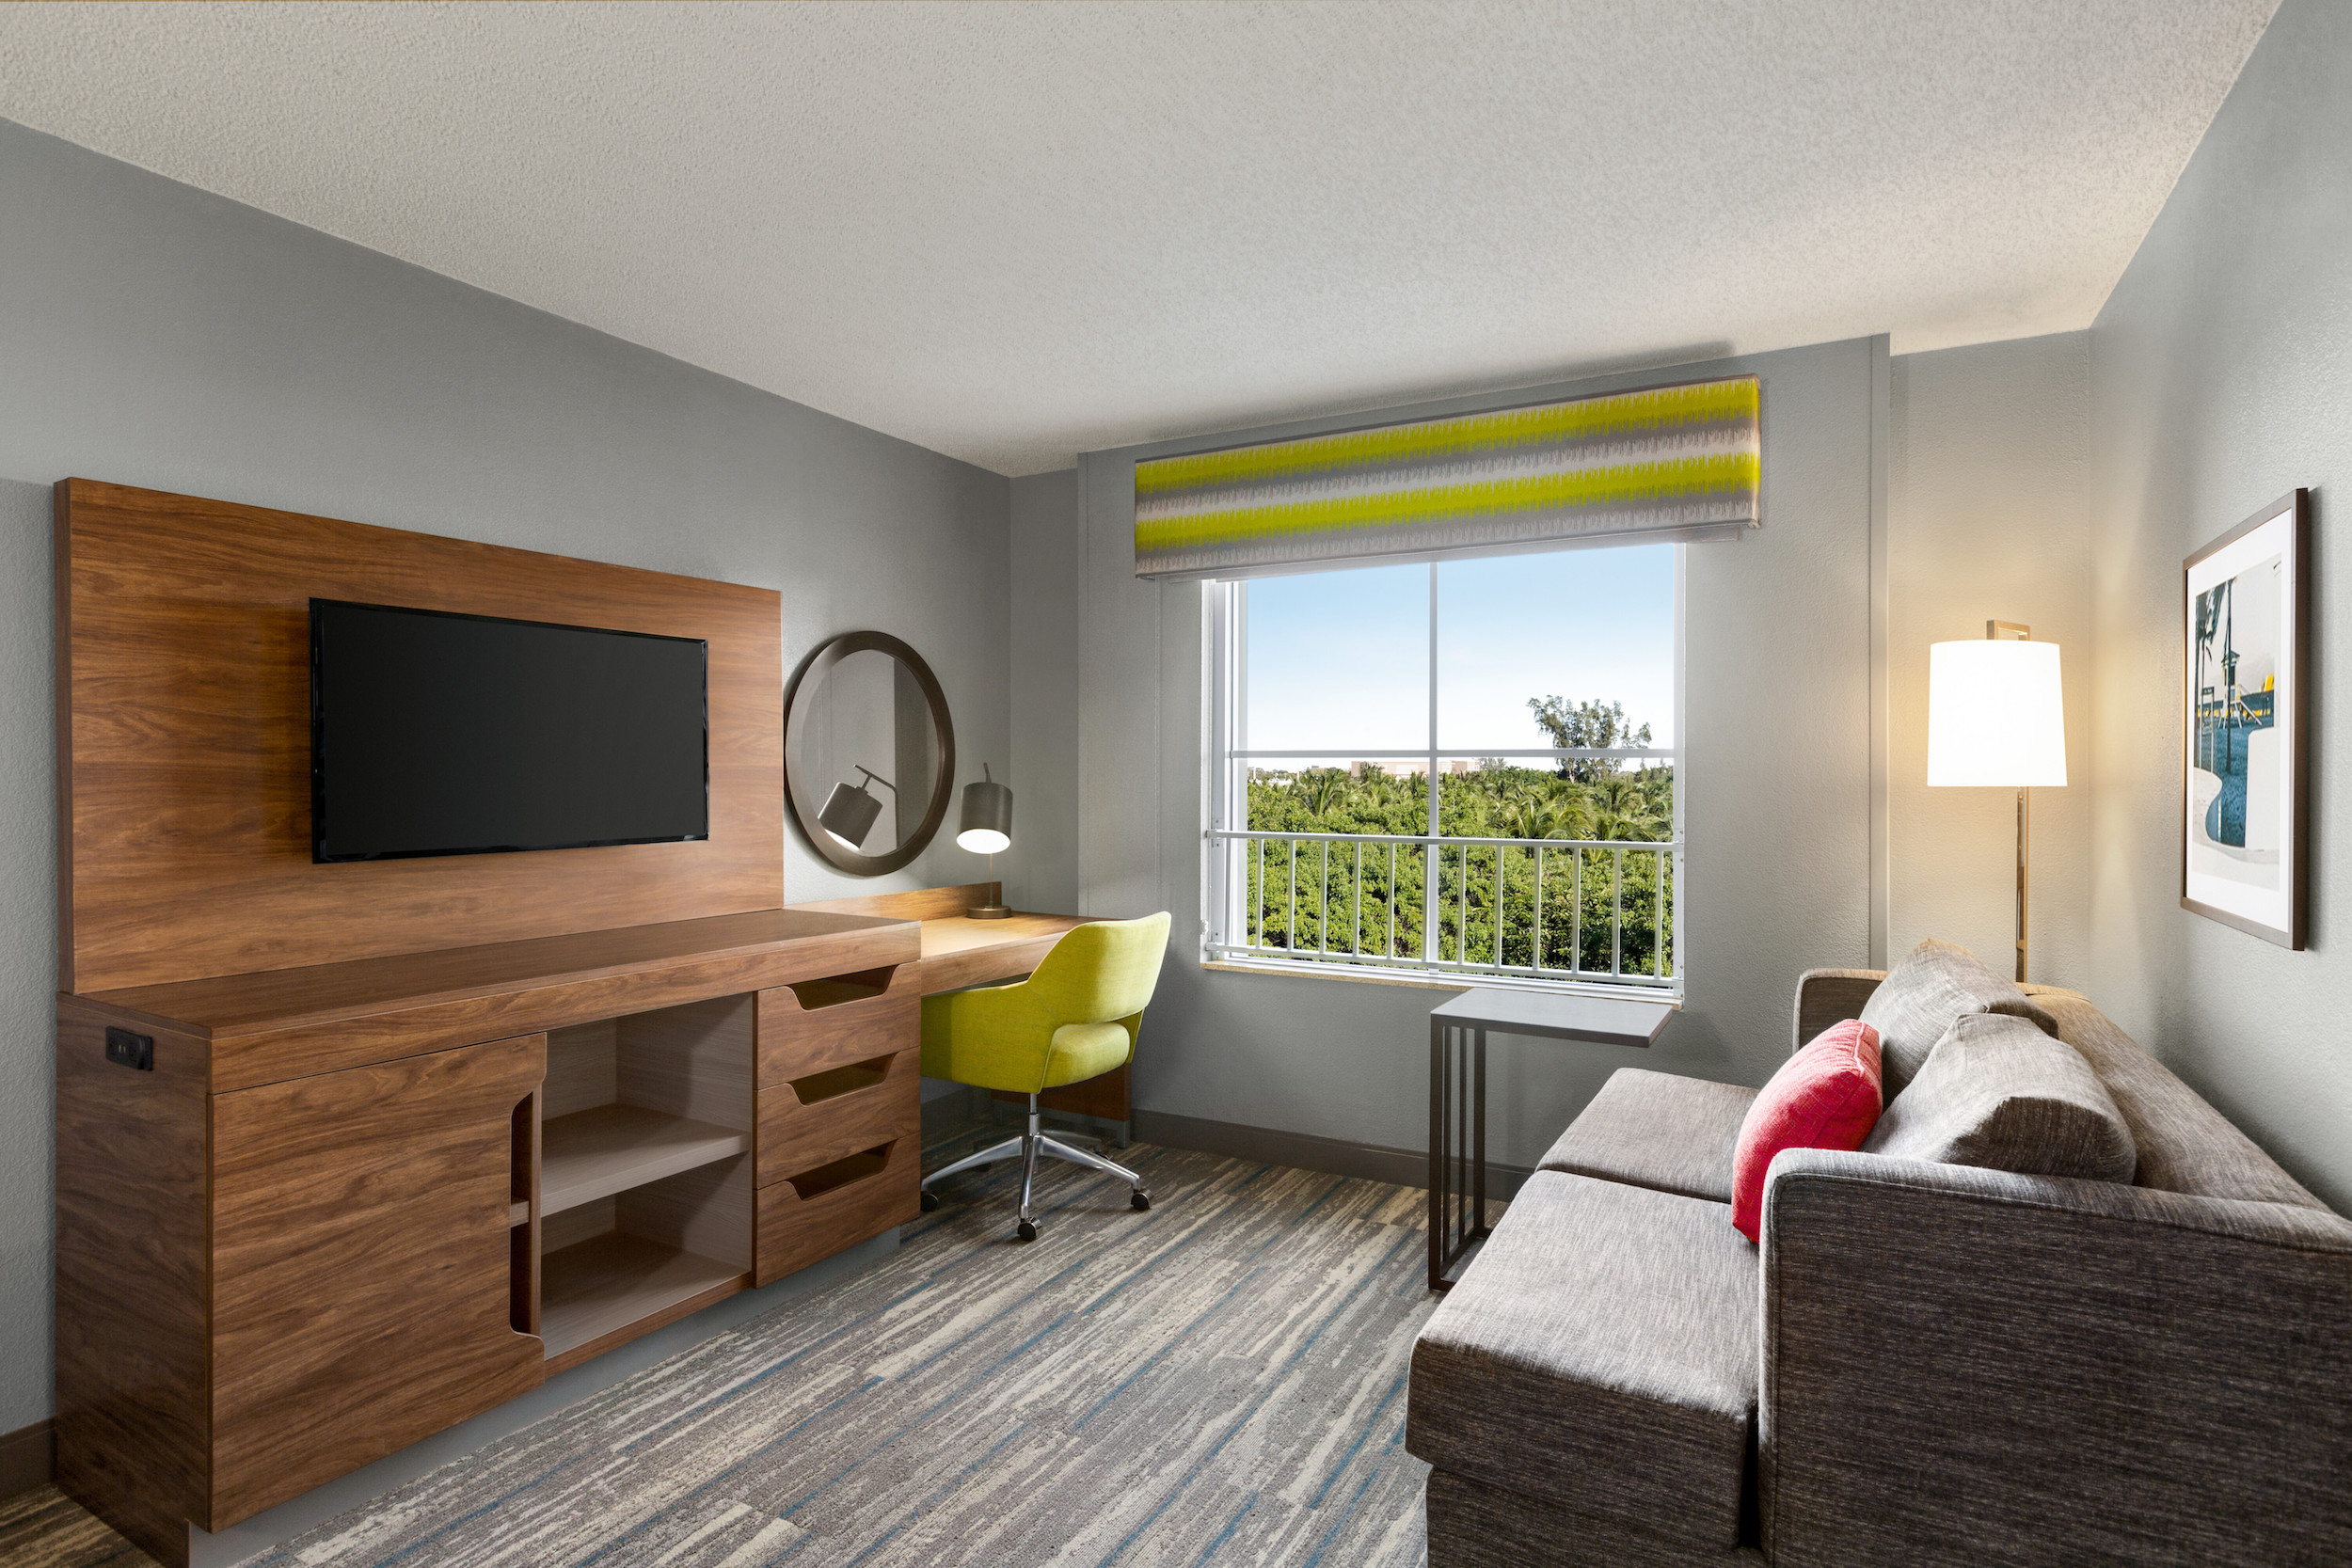 Hampton Inn & Suites Ft. Lauderdale AirportSouth Cruise Port